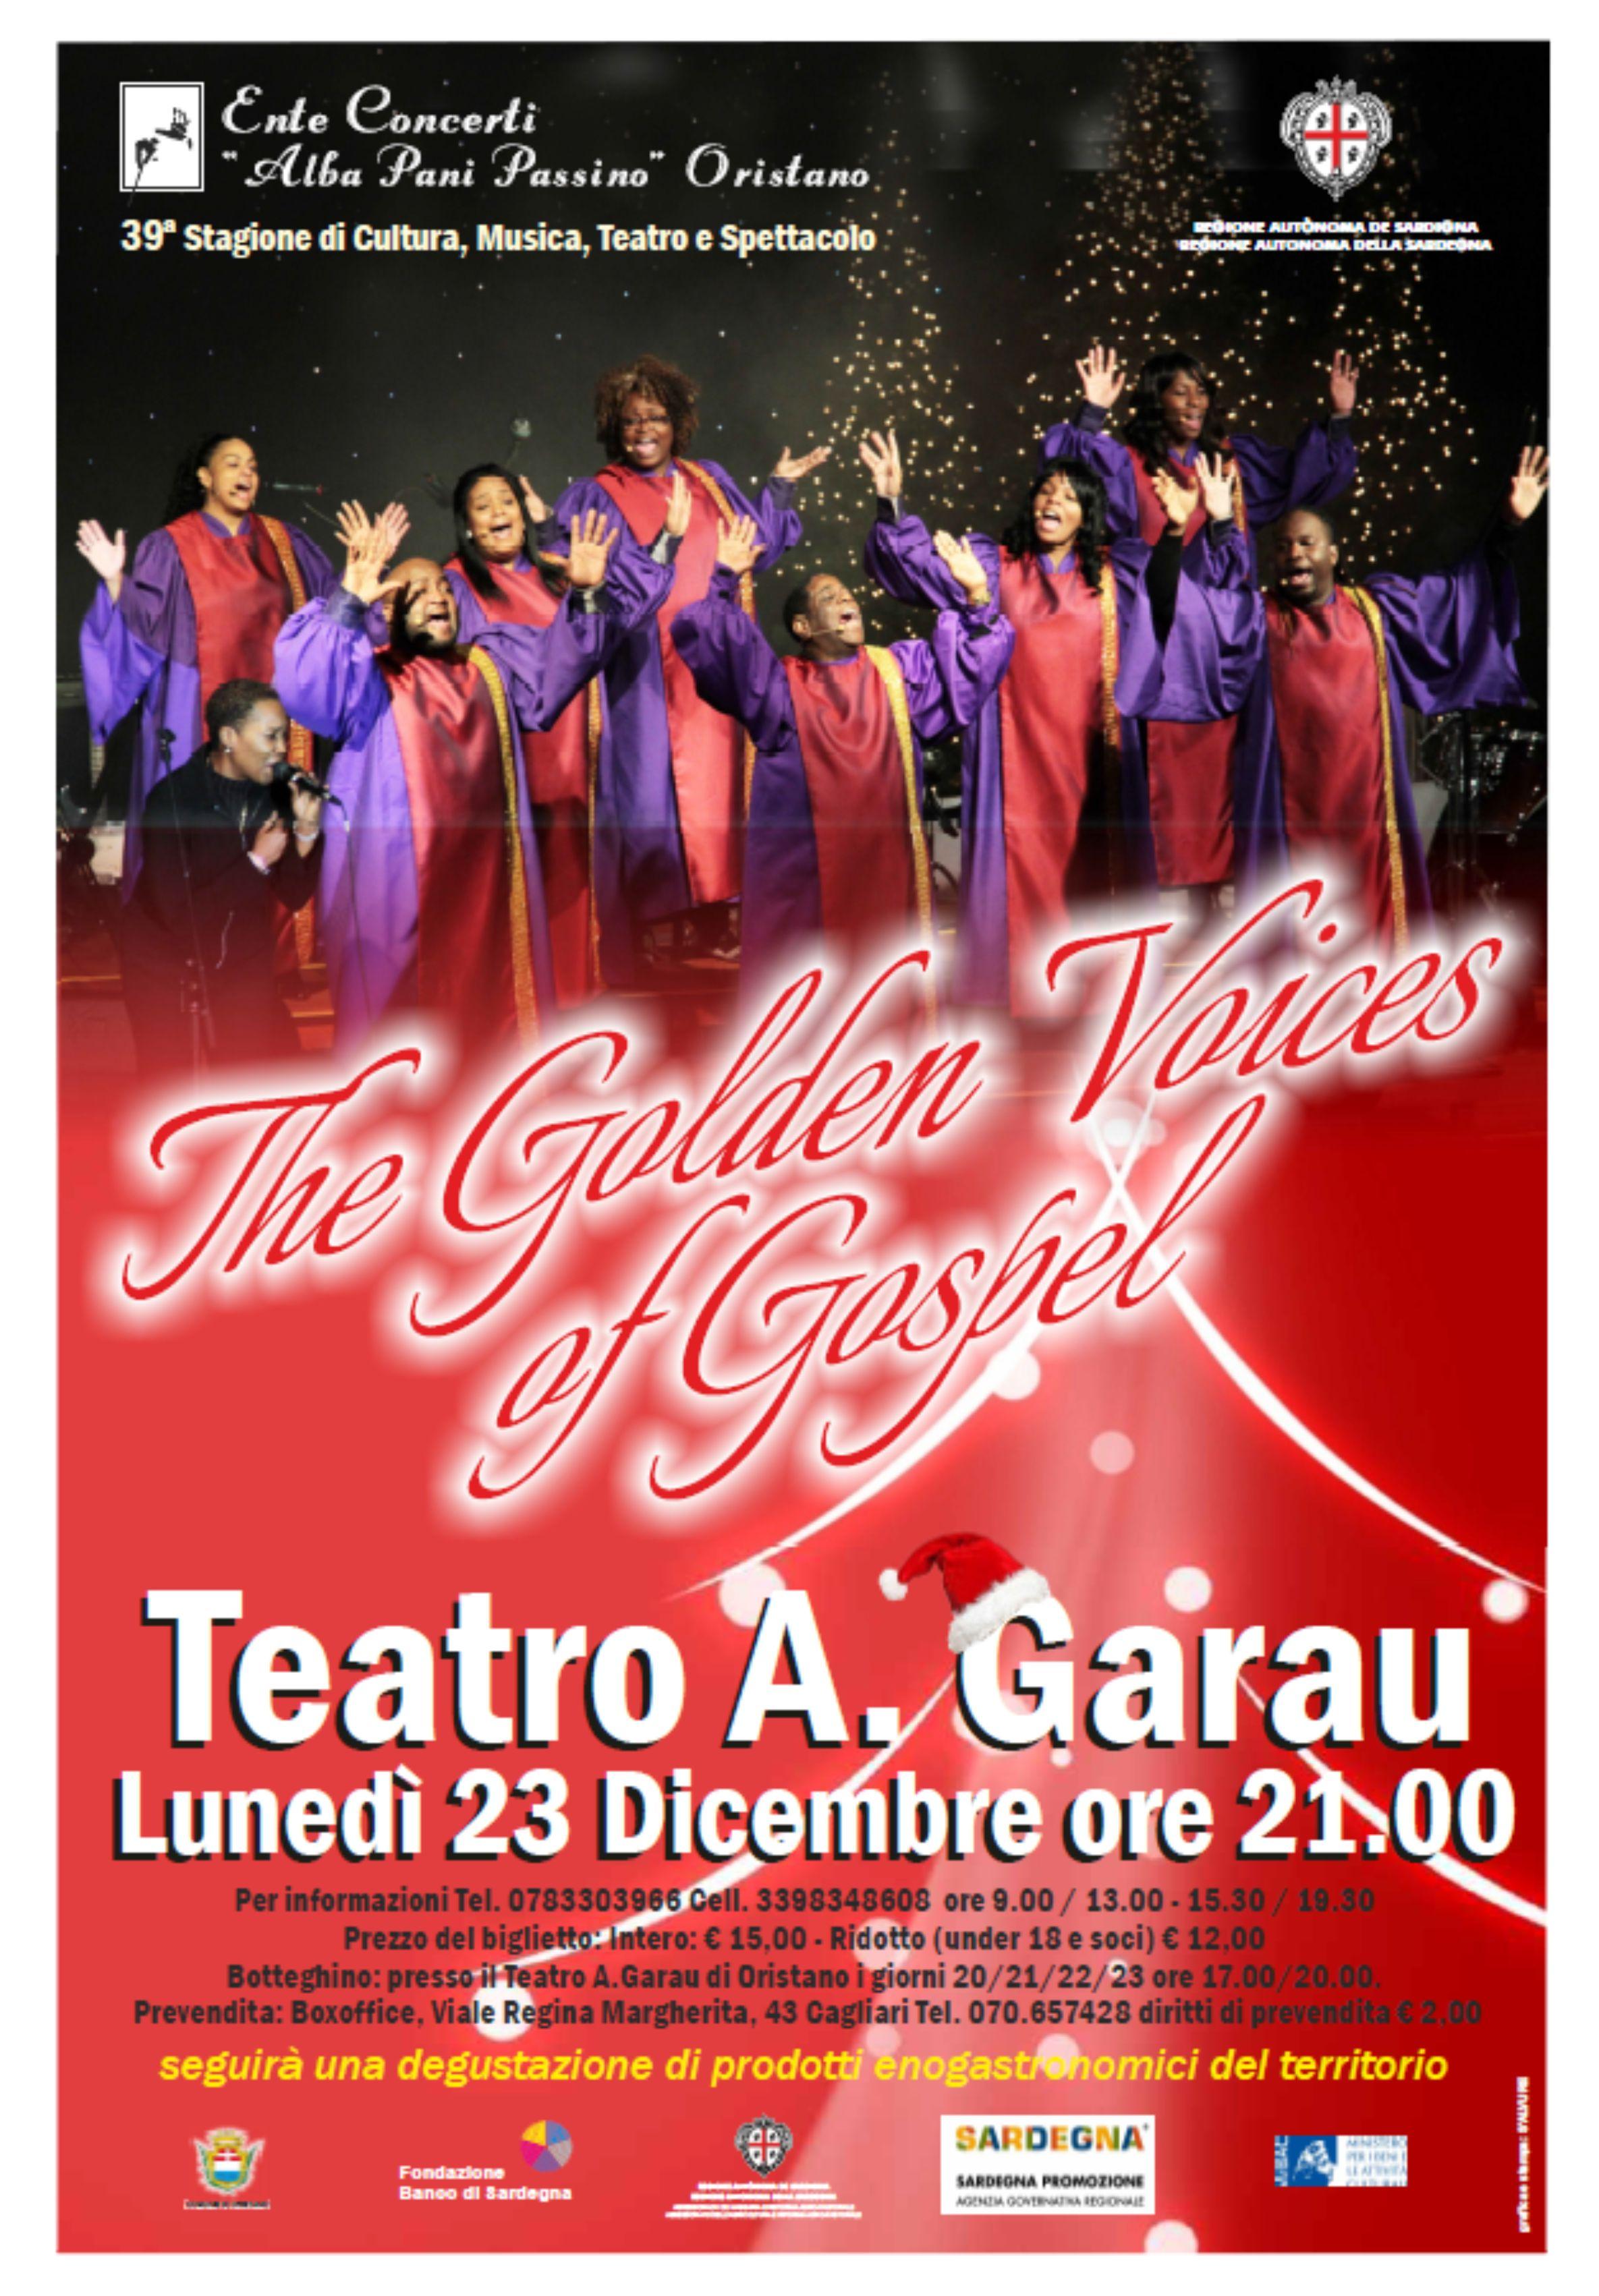 The Golden Voices of Gospel - Lunedì 23 Dicembre a Oristano